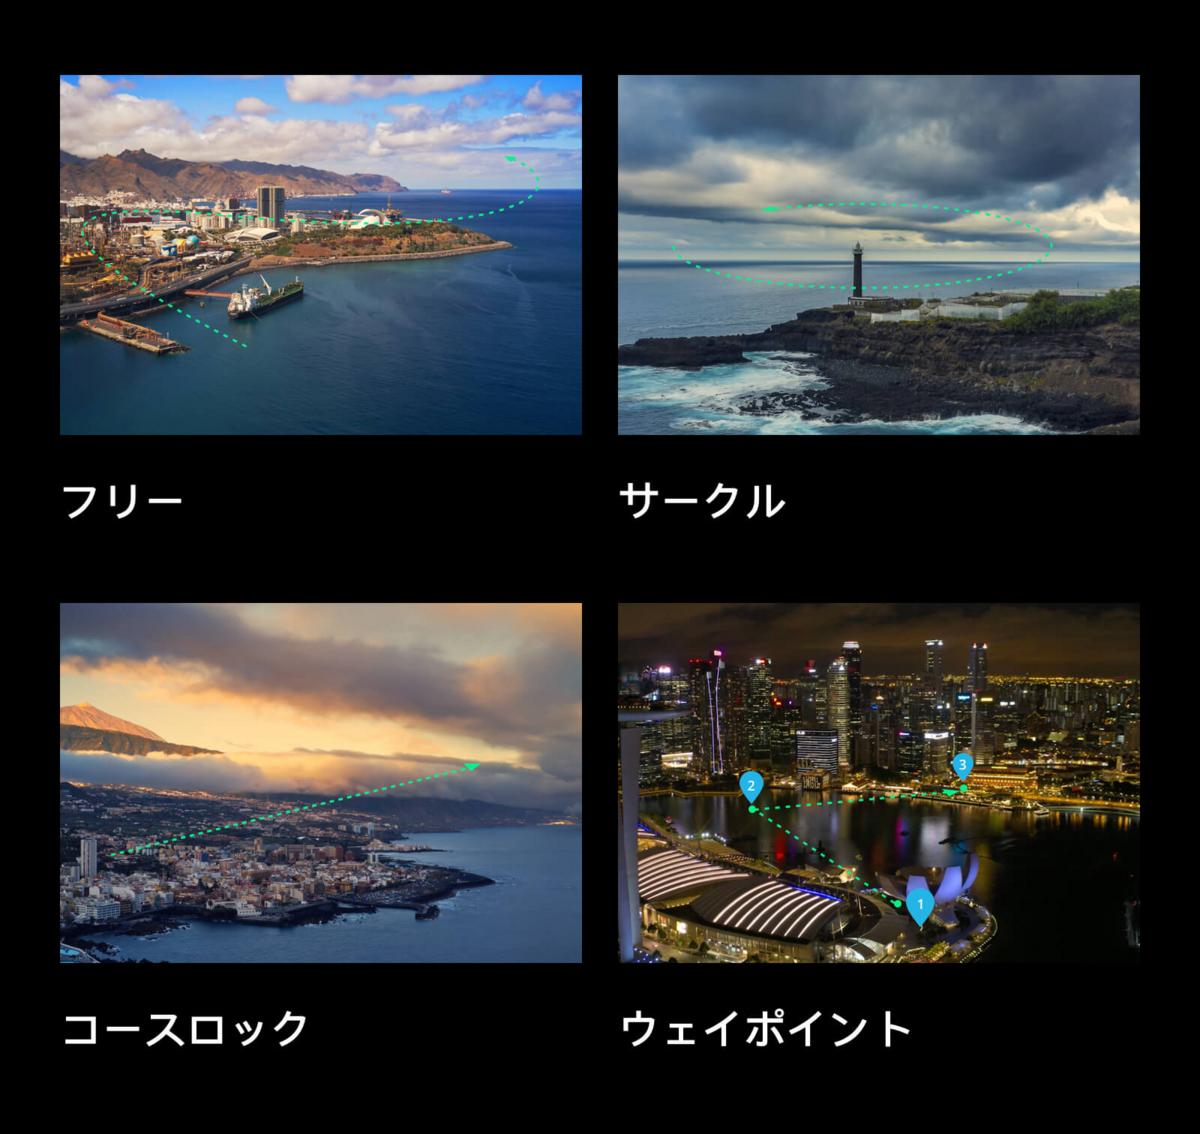 f:id:drone_skyfish:20180824121830j:plain